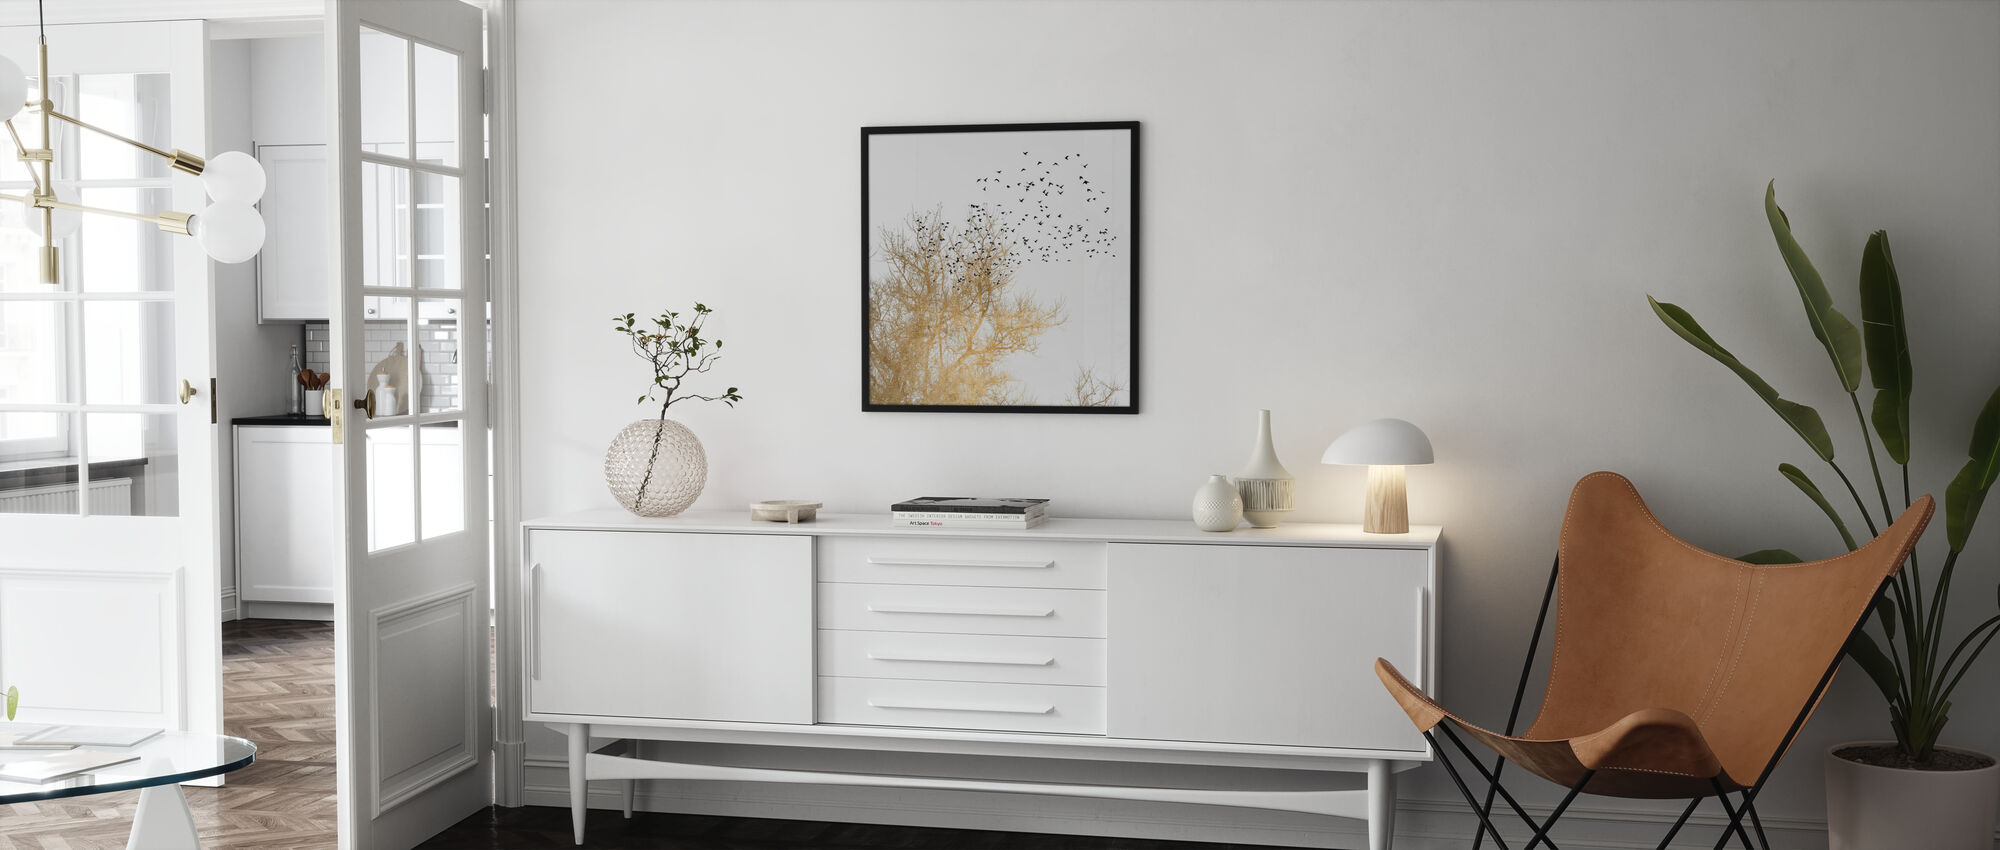 Gouden Vogels - Ingelijste print - Woonkamer